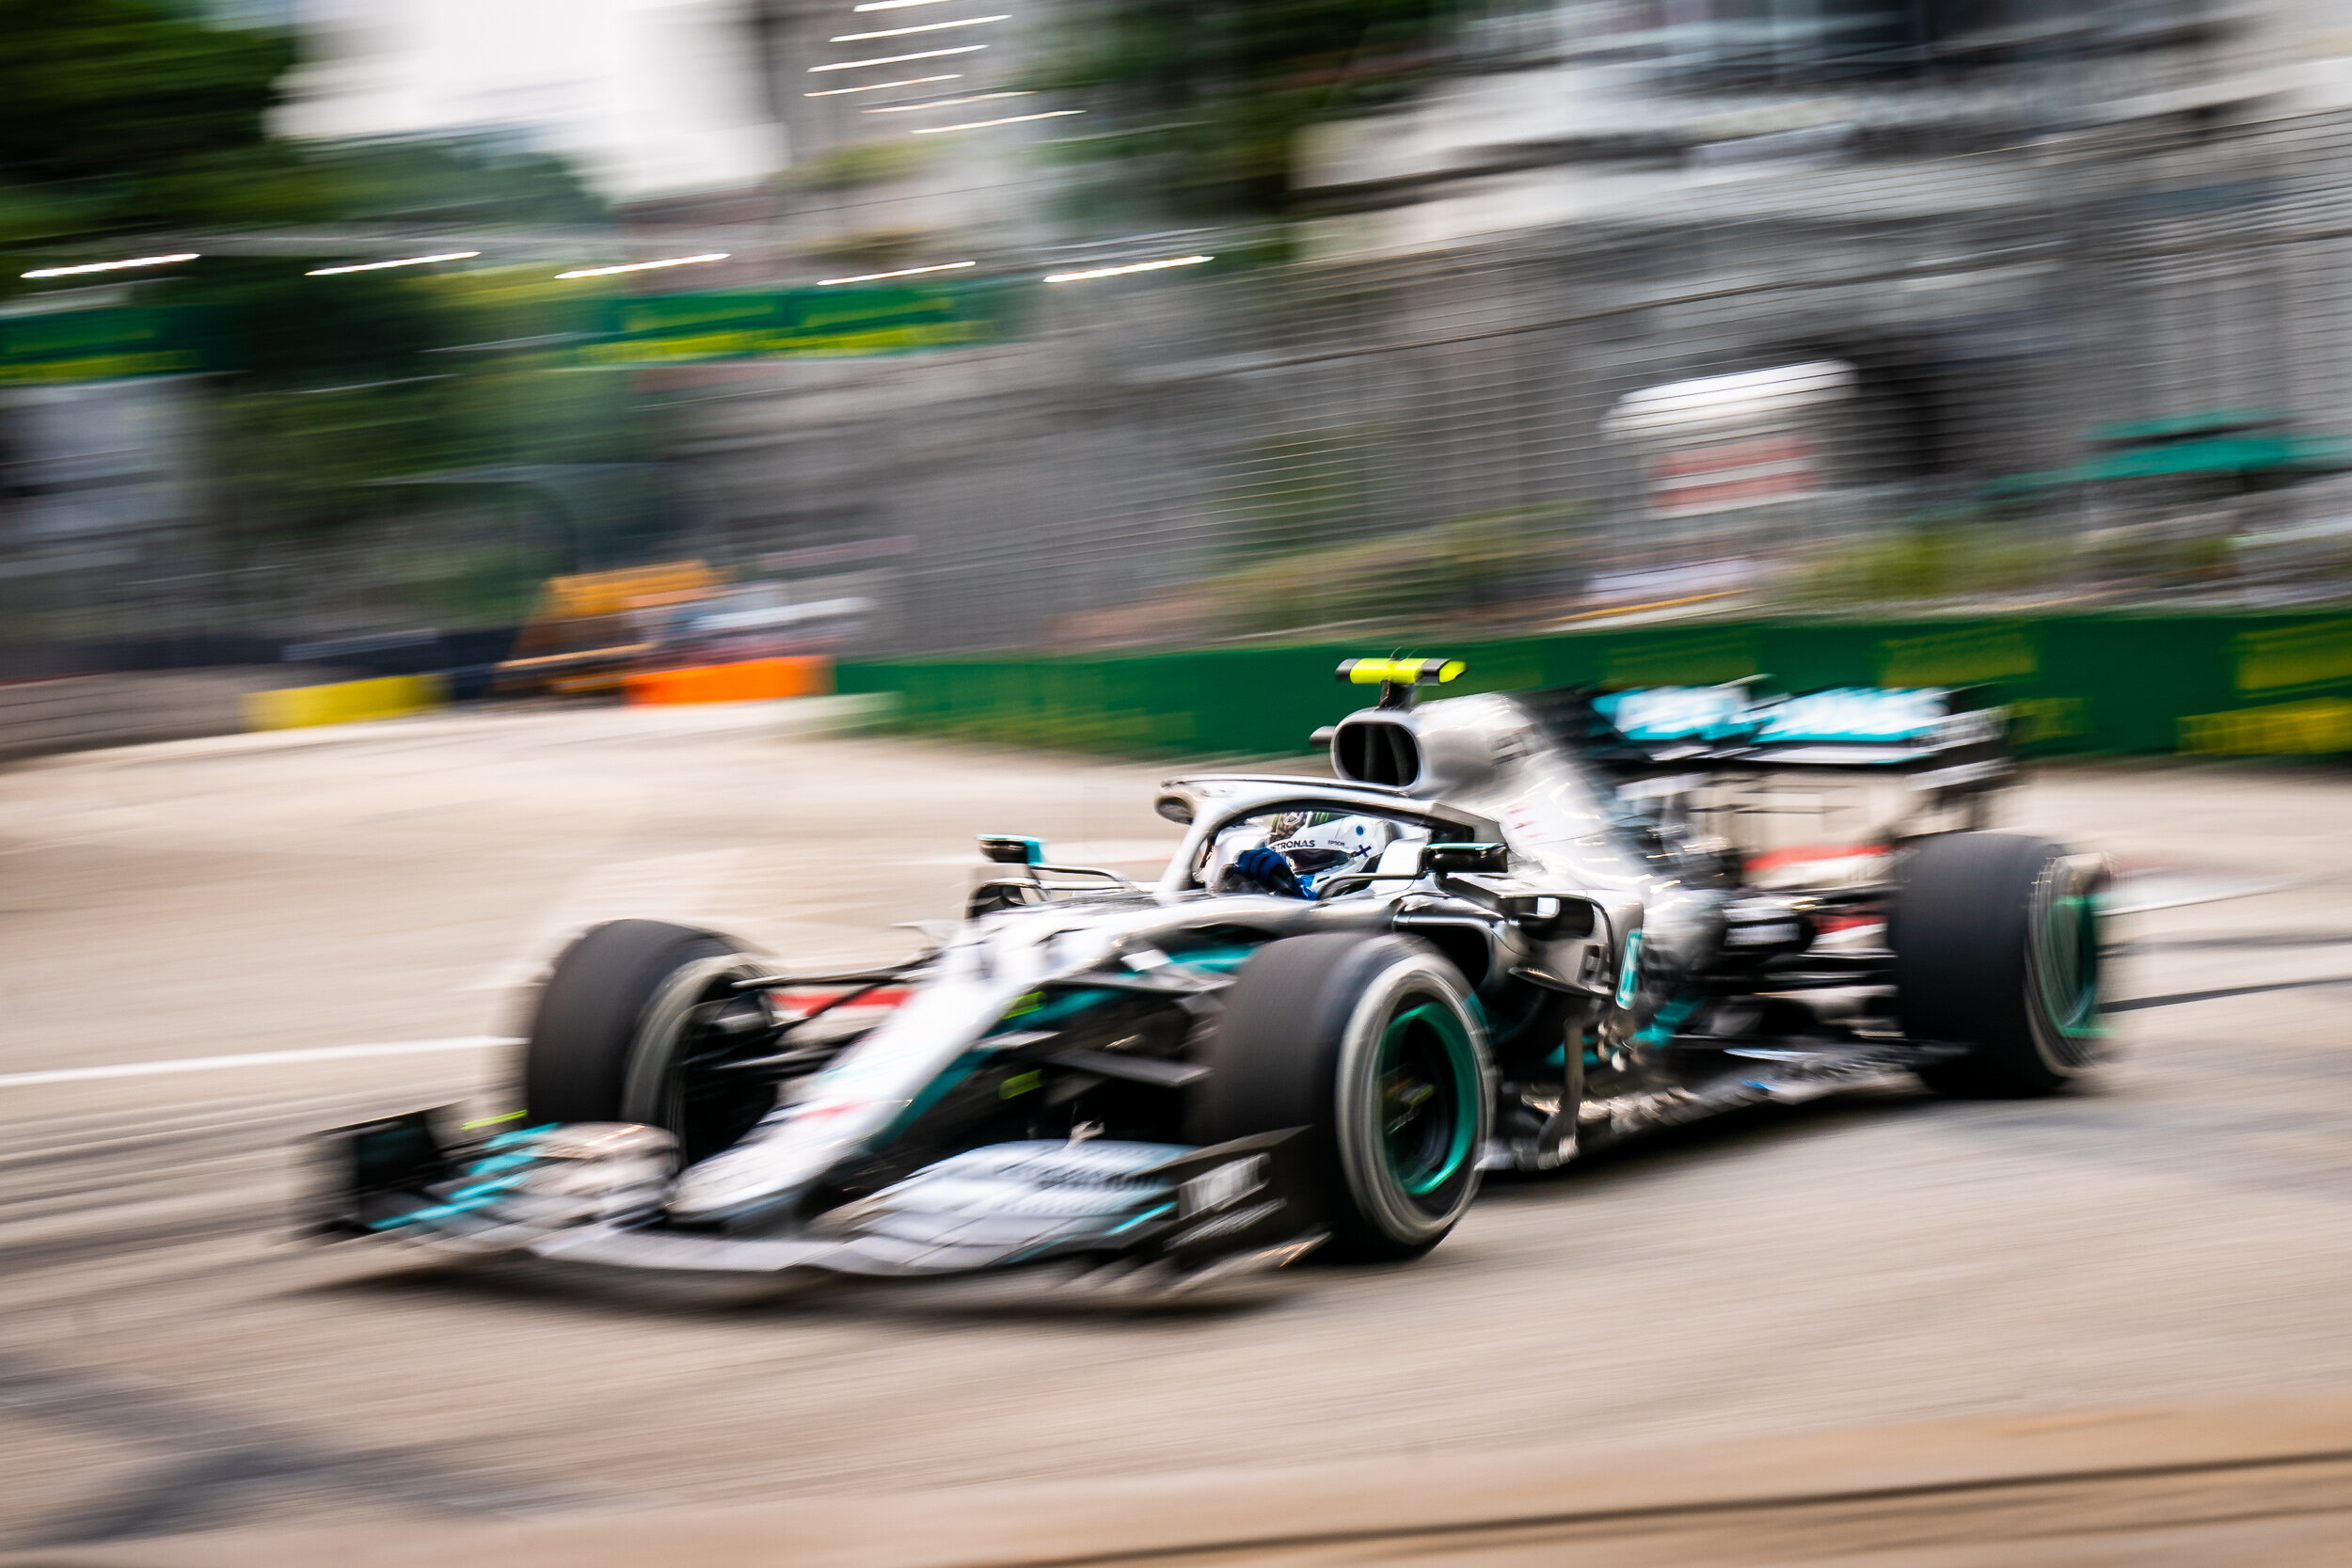 Lewis Hamilton, Singapore Formula 1